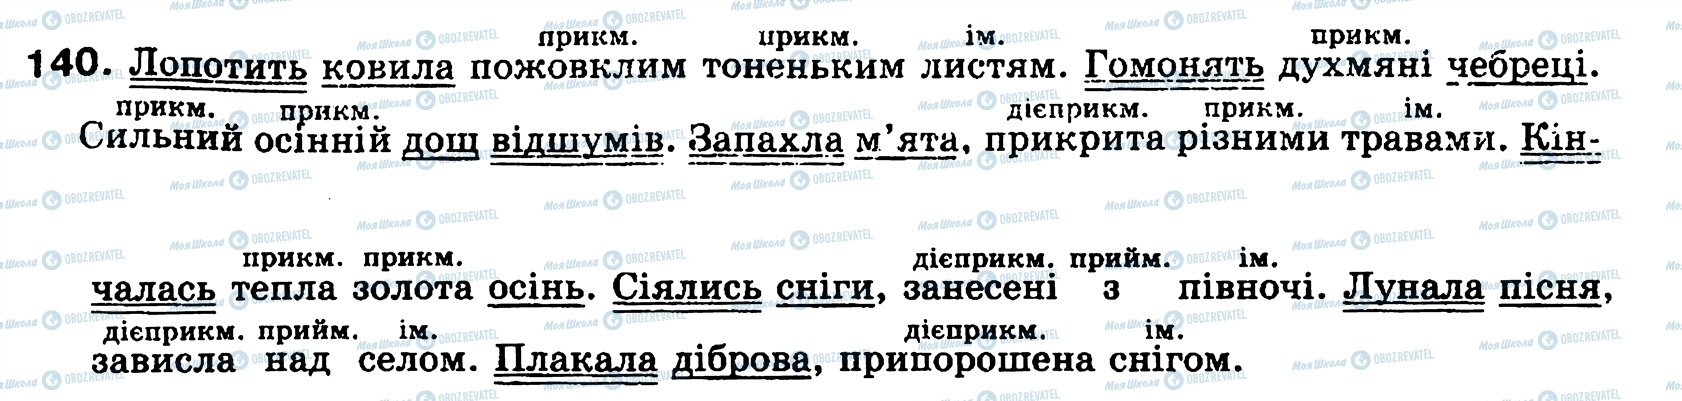 ГДЗ Укр мова 8 класс страница 140